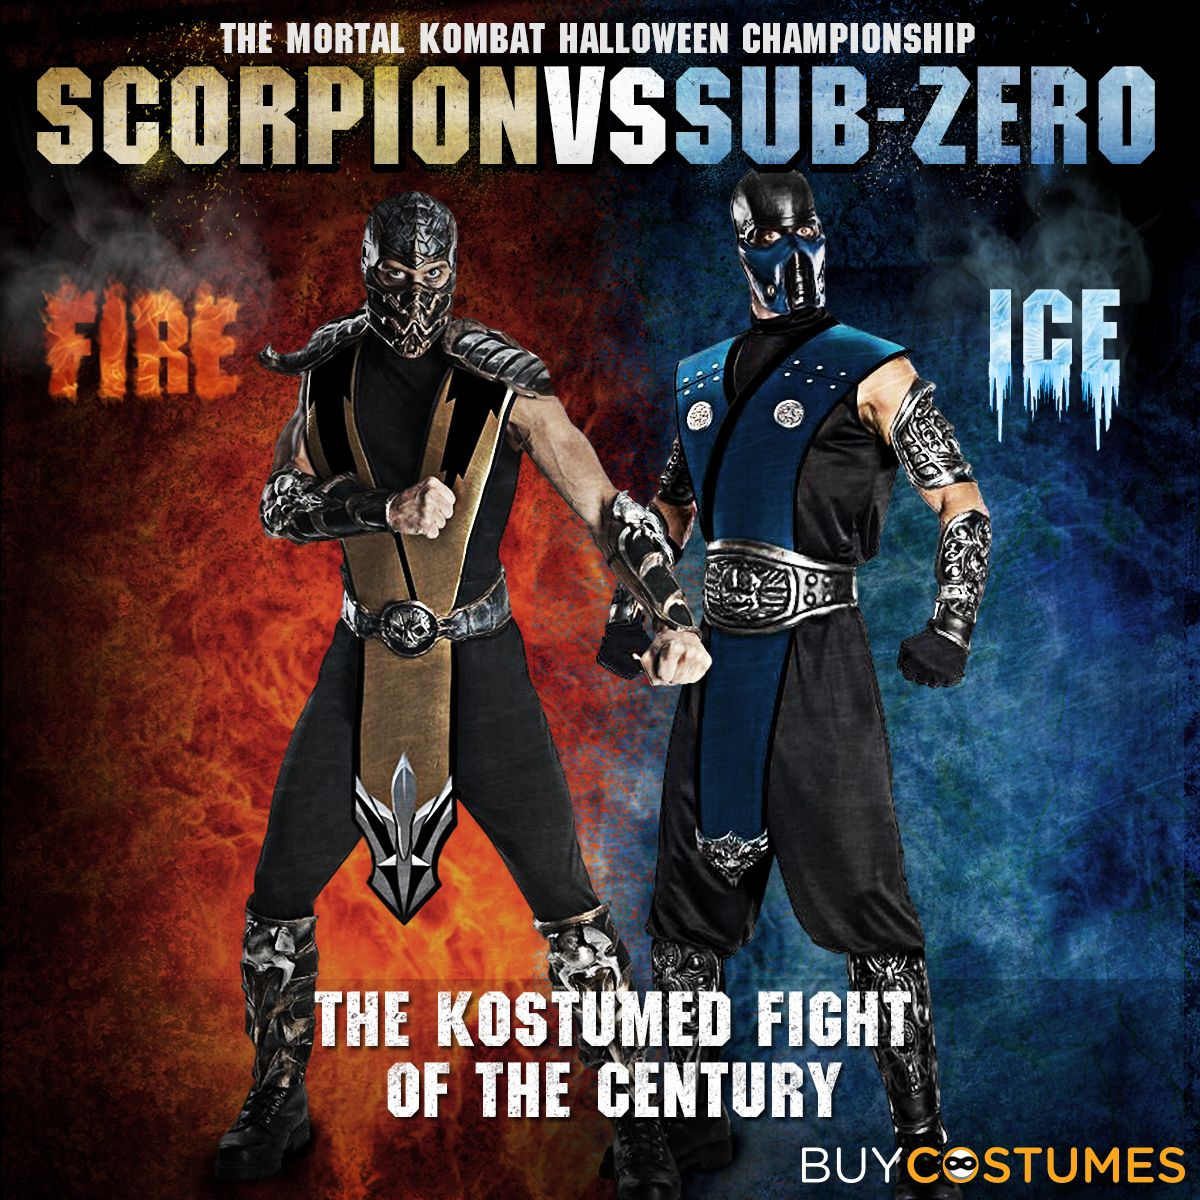 Mortal Kombat X: New Characters, Alt costume, Returning